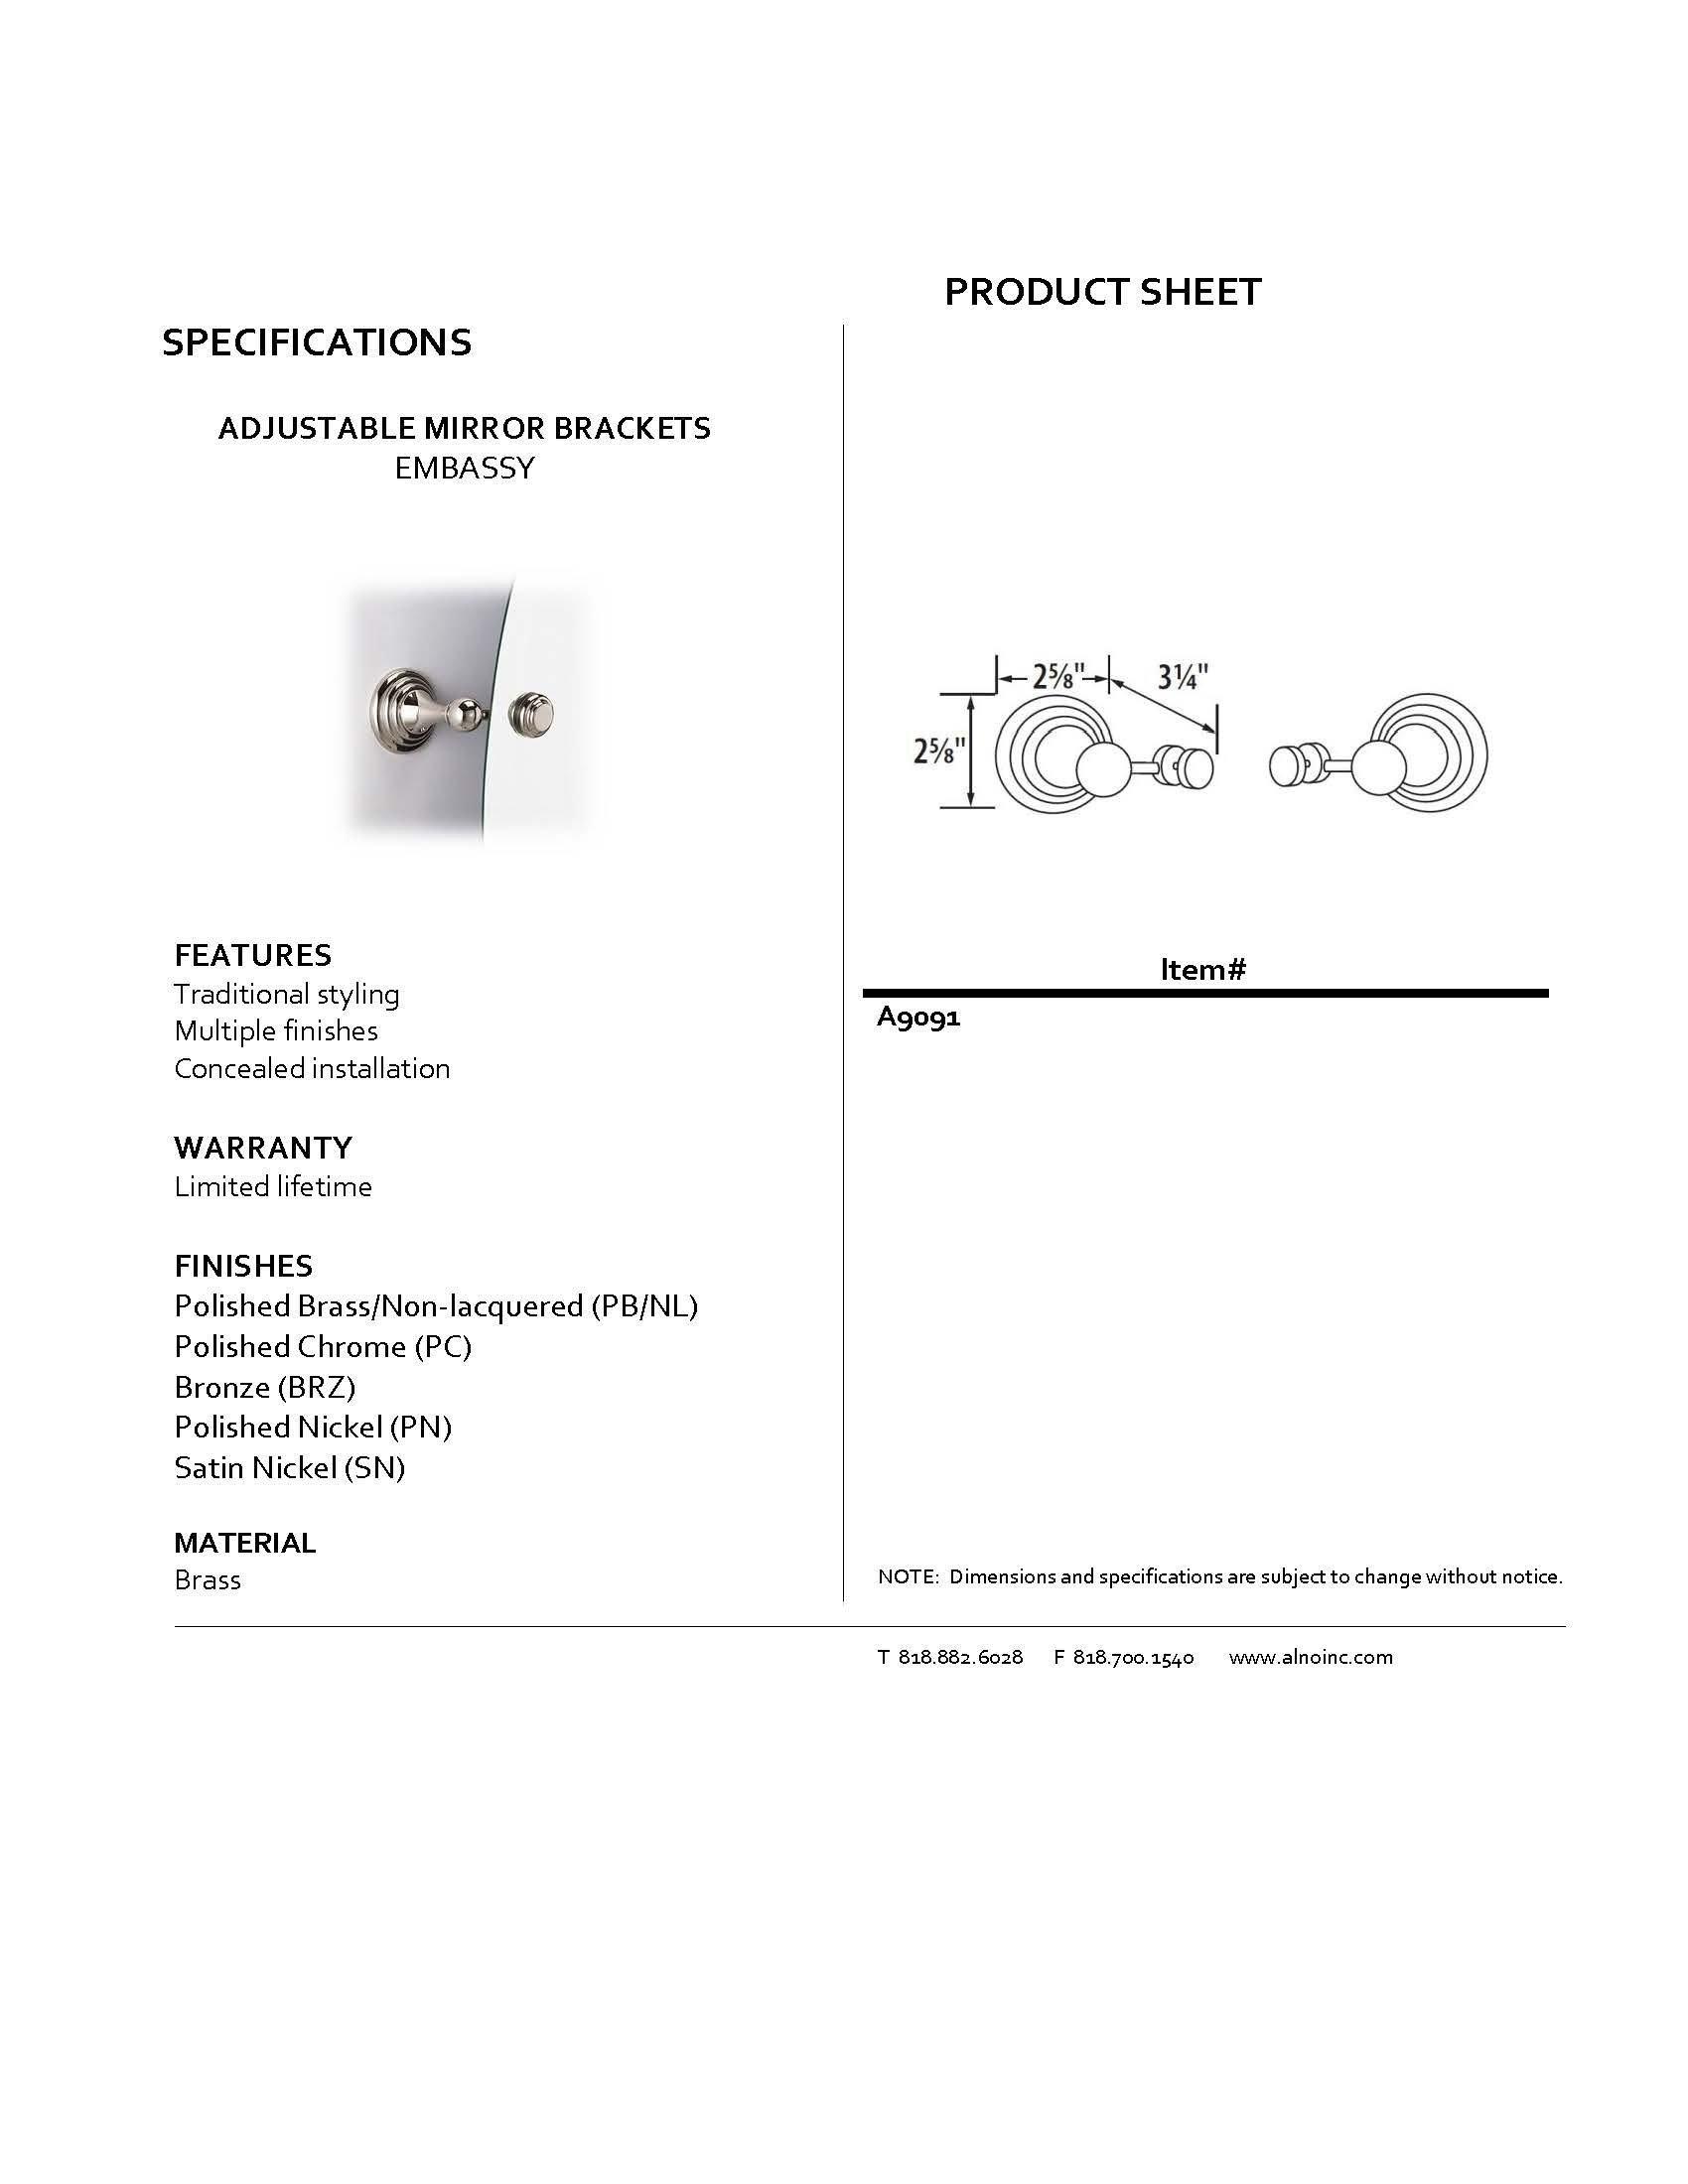 Alno A9091-PN Traditional Embassy Adjustable Mirror Brackets, Polished Nickel